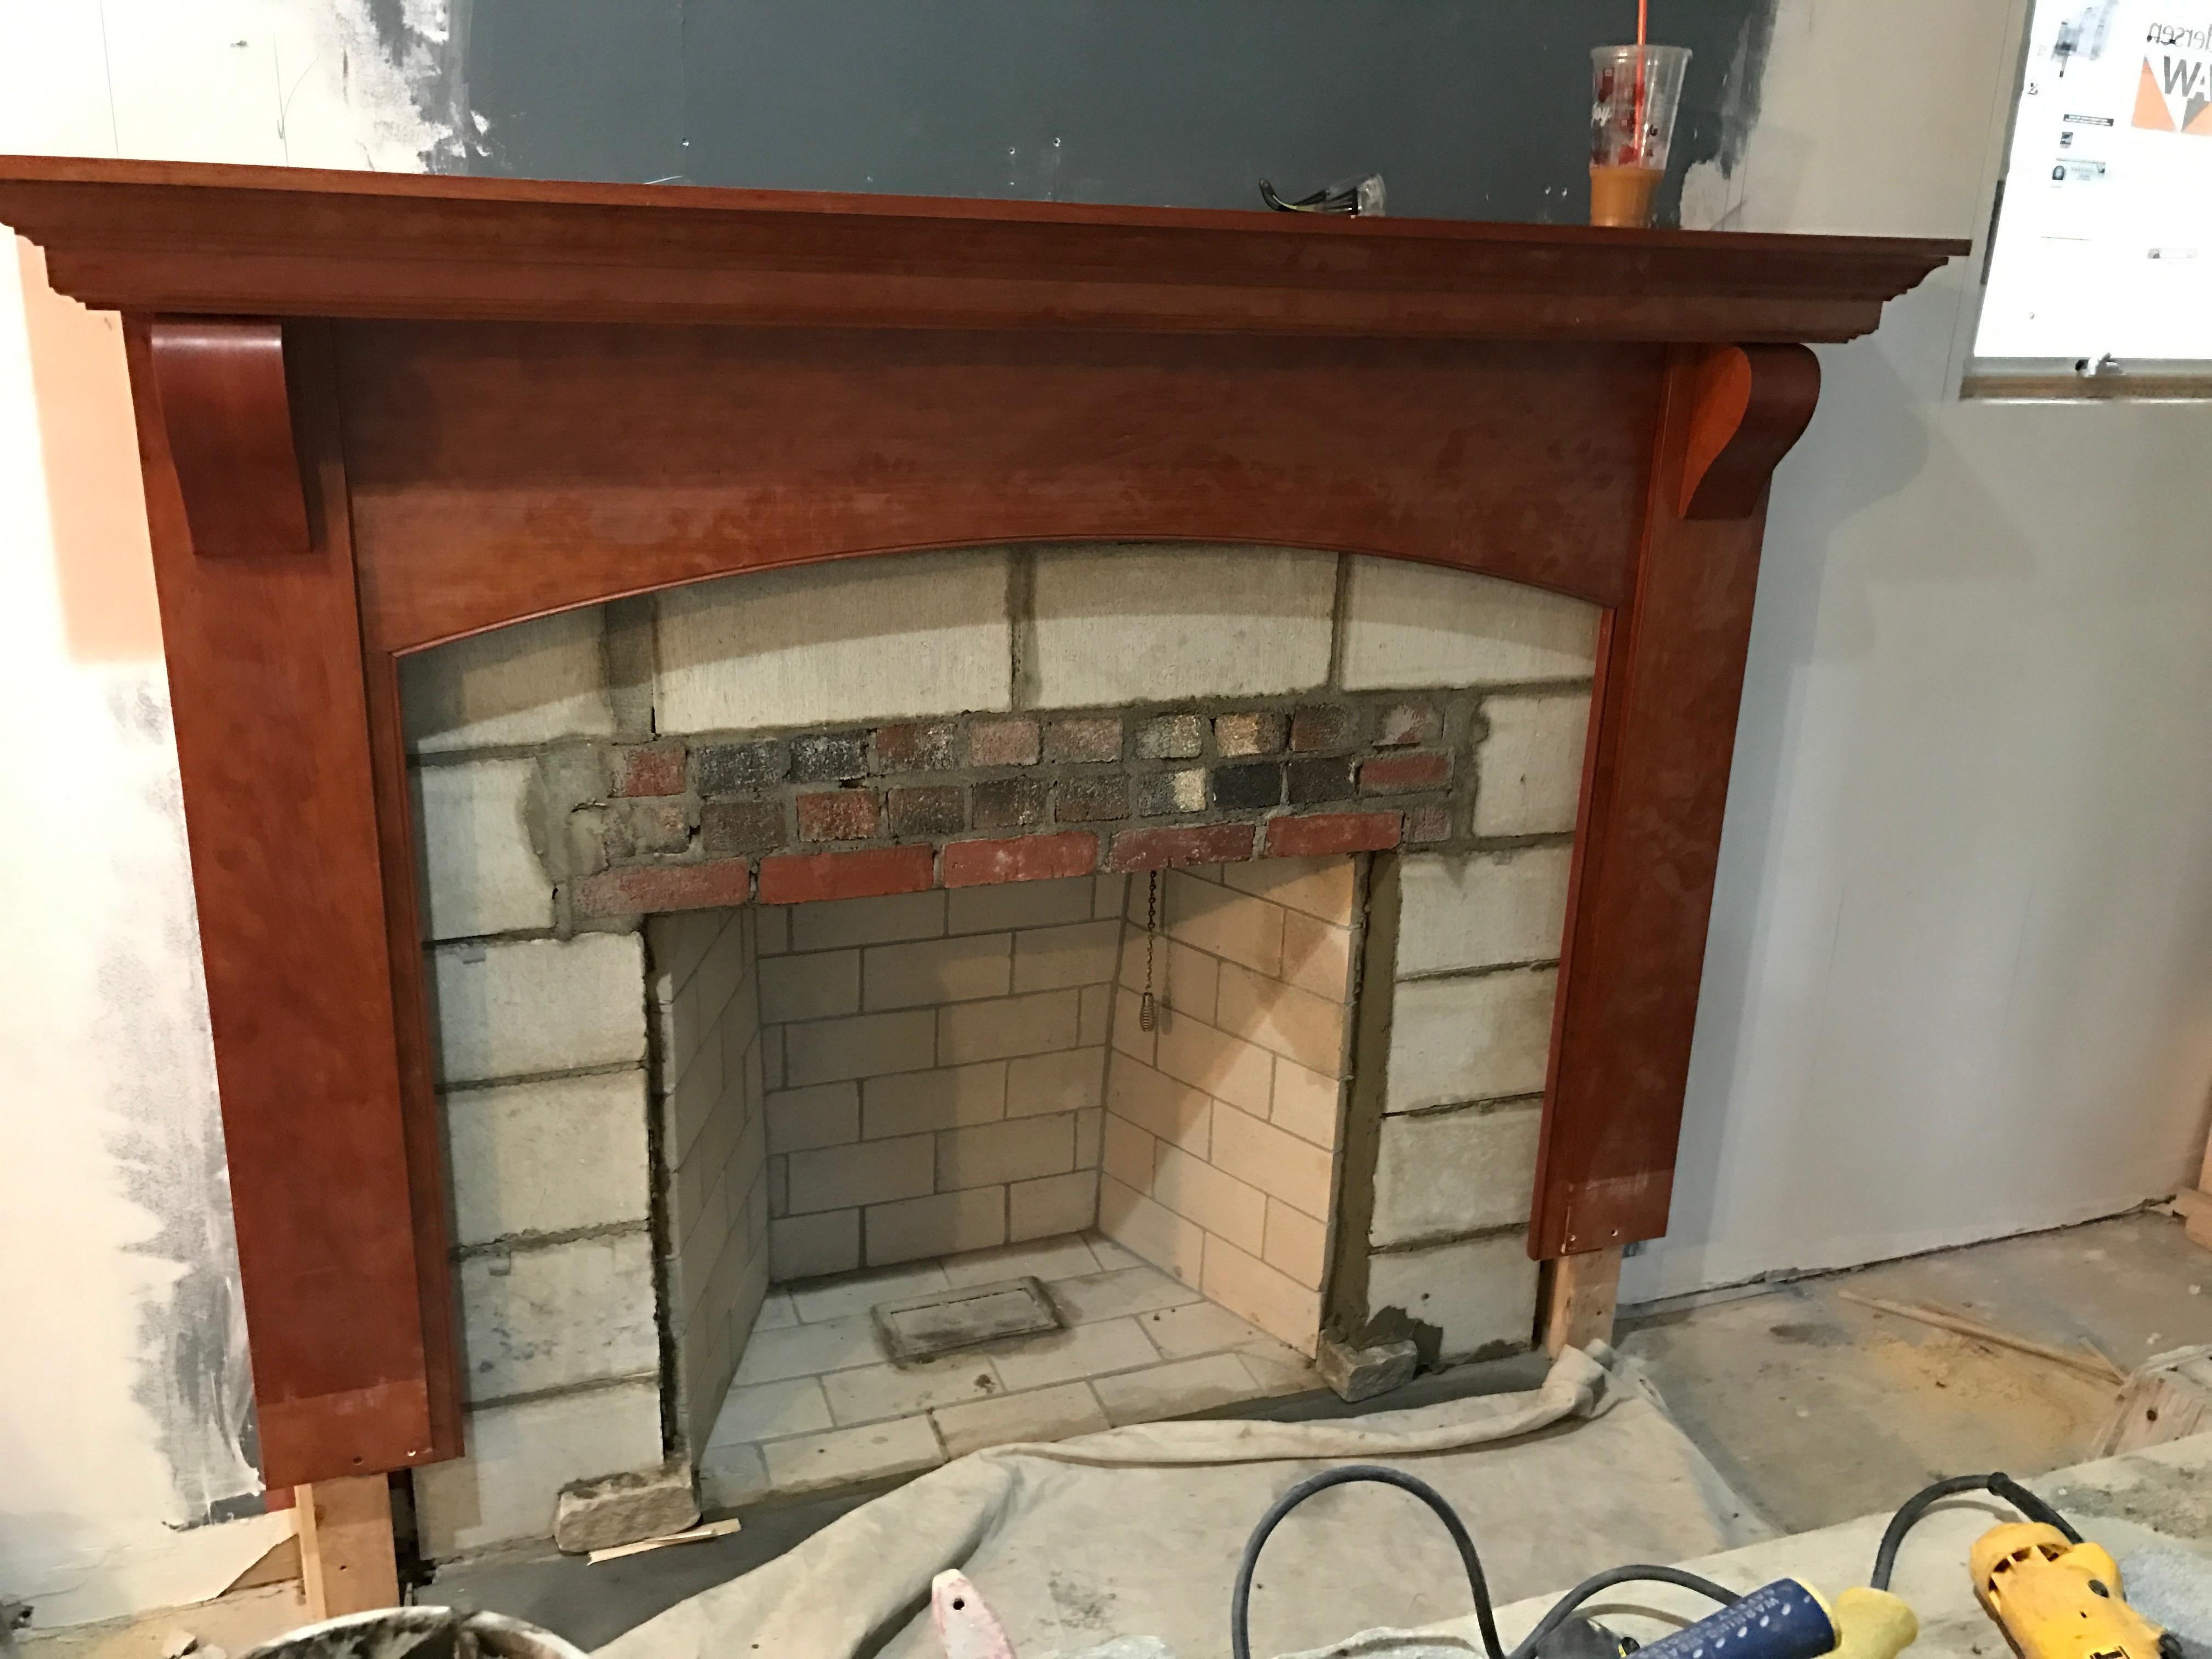 Re laying a firebox-1ec1abf1-0036-4629-93bb-8dea08150a6a.jpg